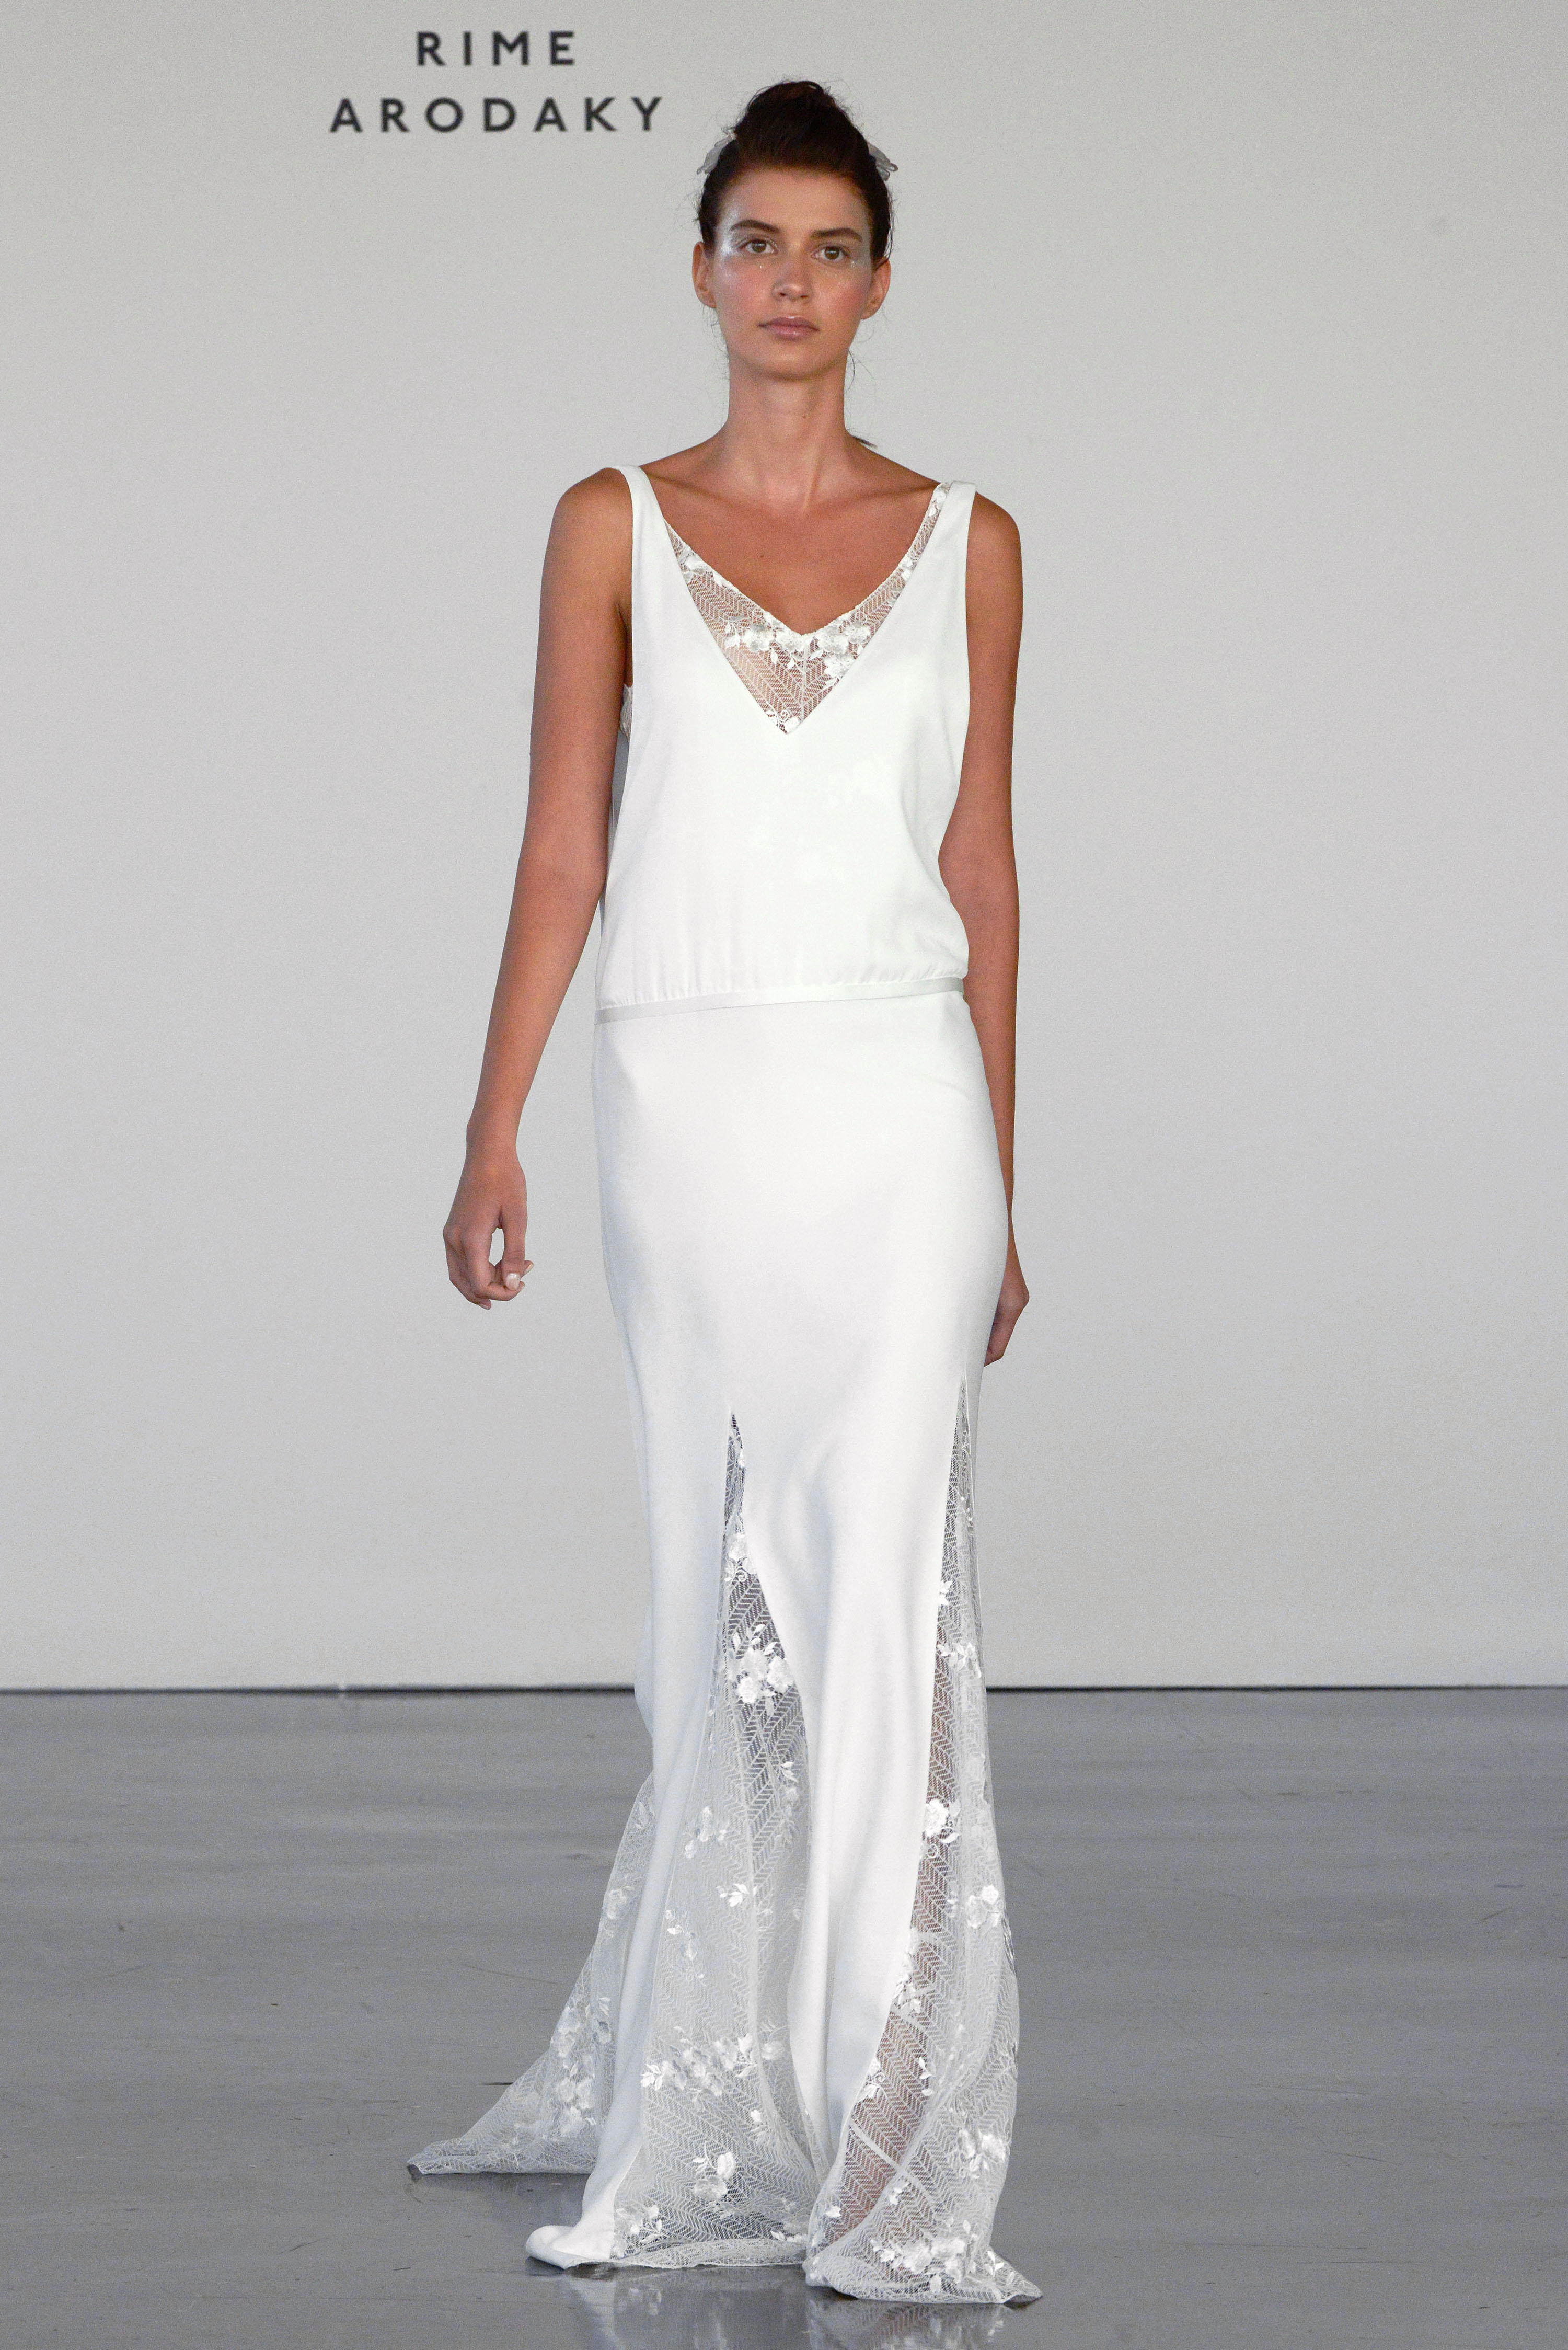 Rime Arodaky wedding dress 20 Fall 2017